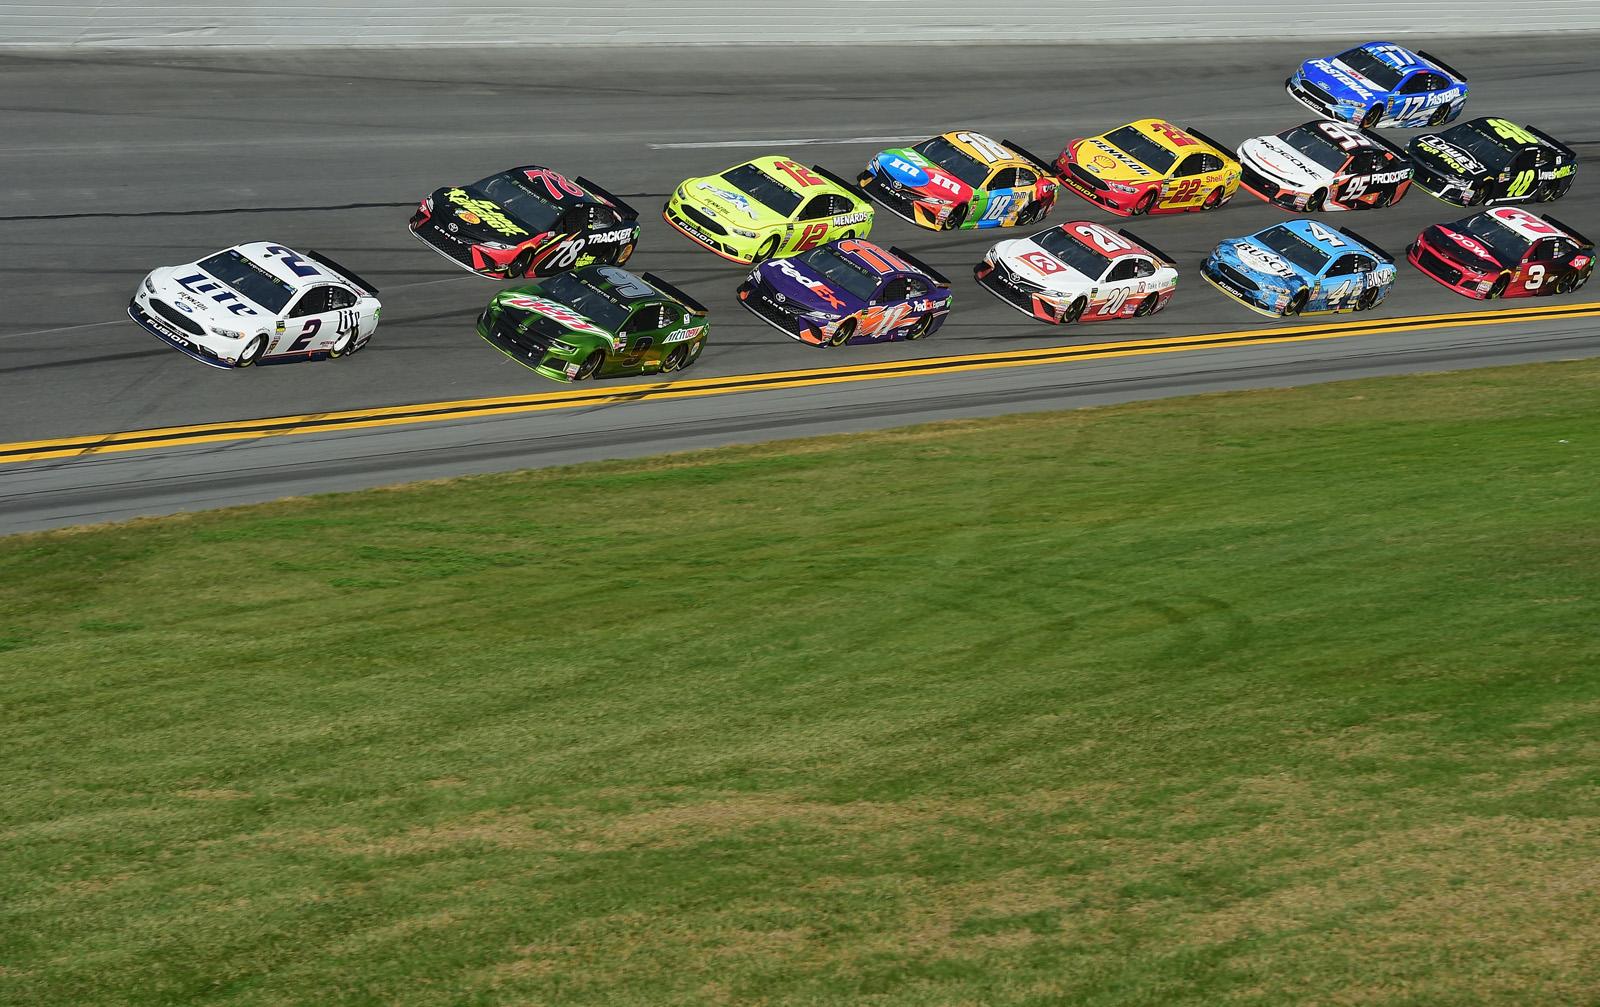 Monster Energy NASCAR Cup Series Advance Auto Parts Clash